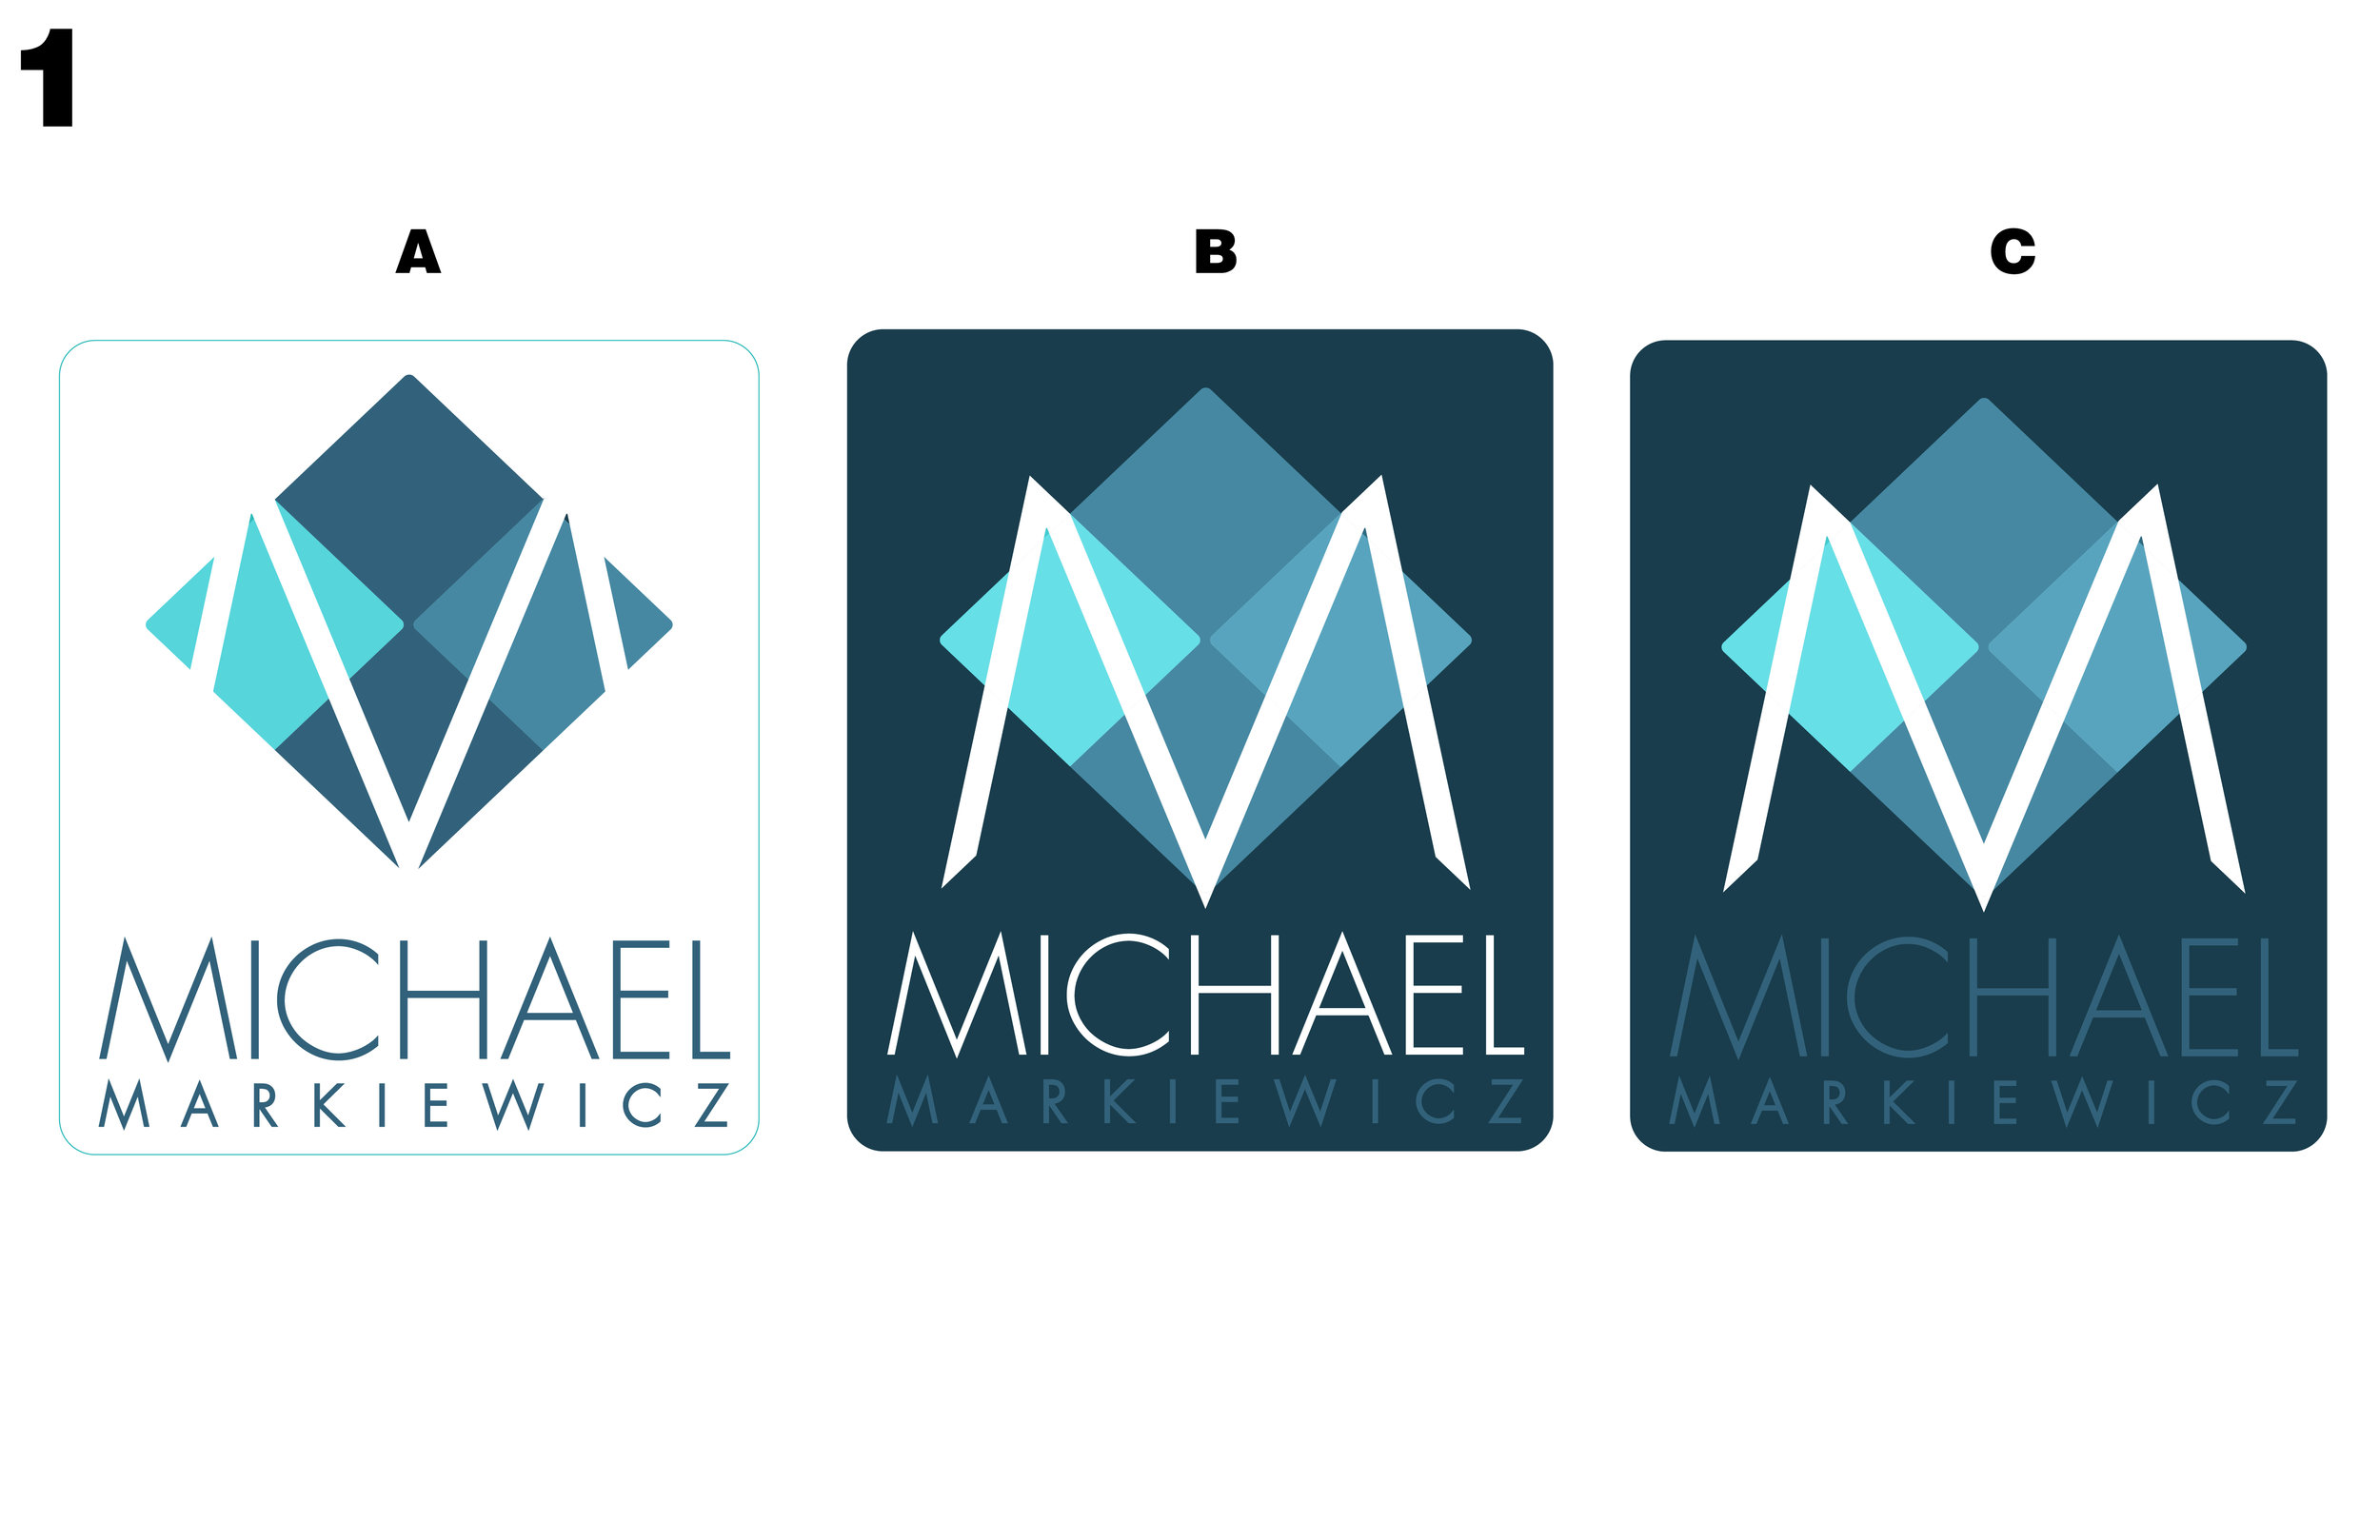 MichaelMarkiewicz-Series2-1-01.jpg